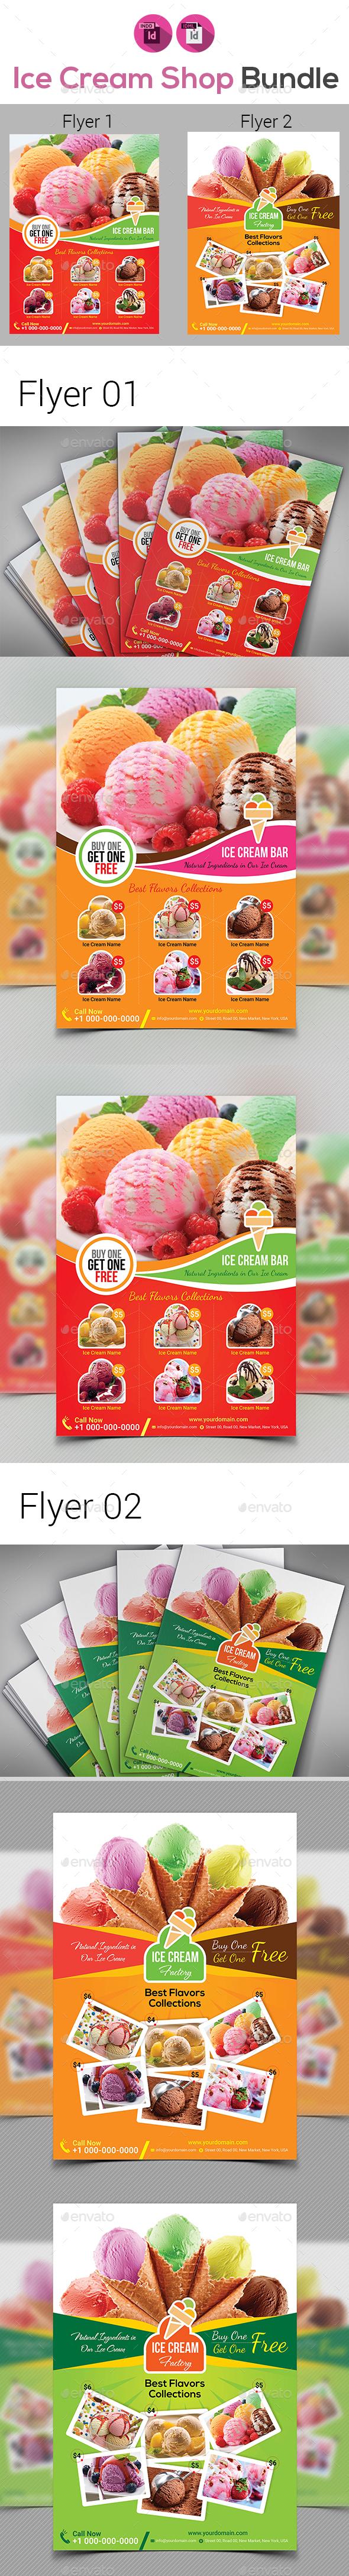 Ice Cream Shop Flyers Bundle